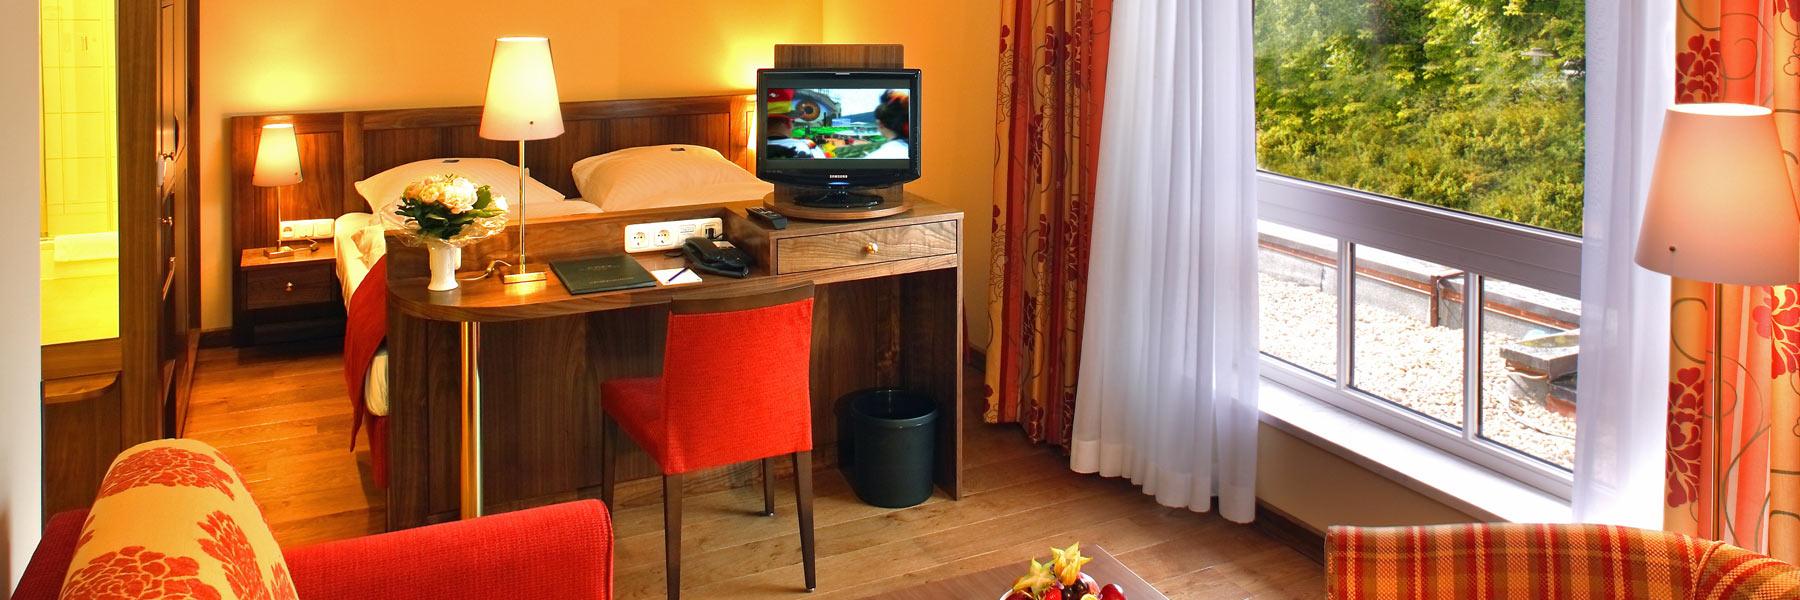 Zimmer - Hotel Warnemünder Hof